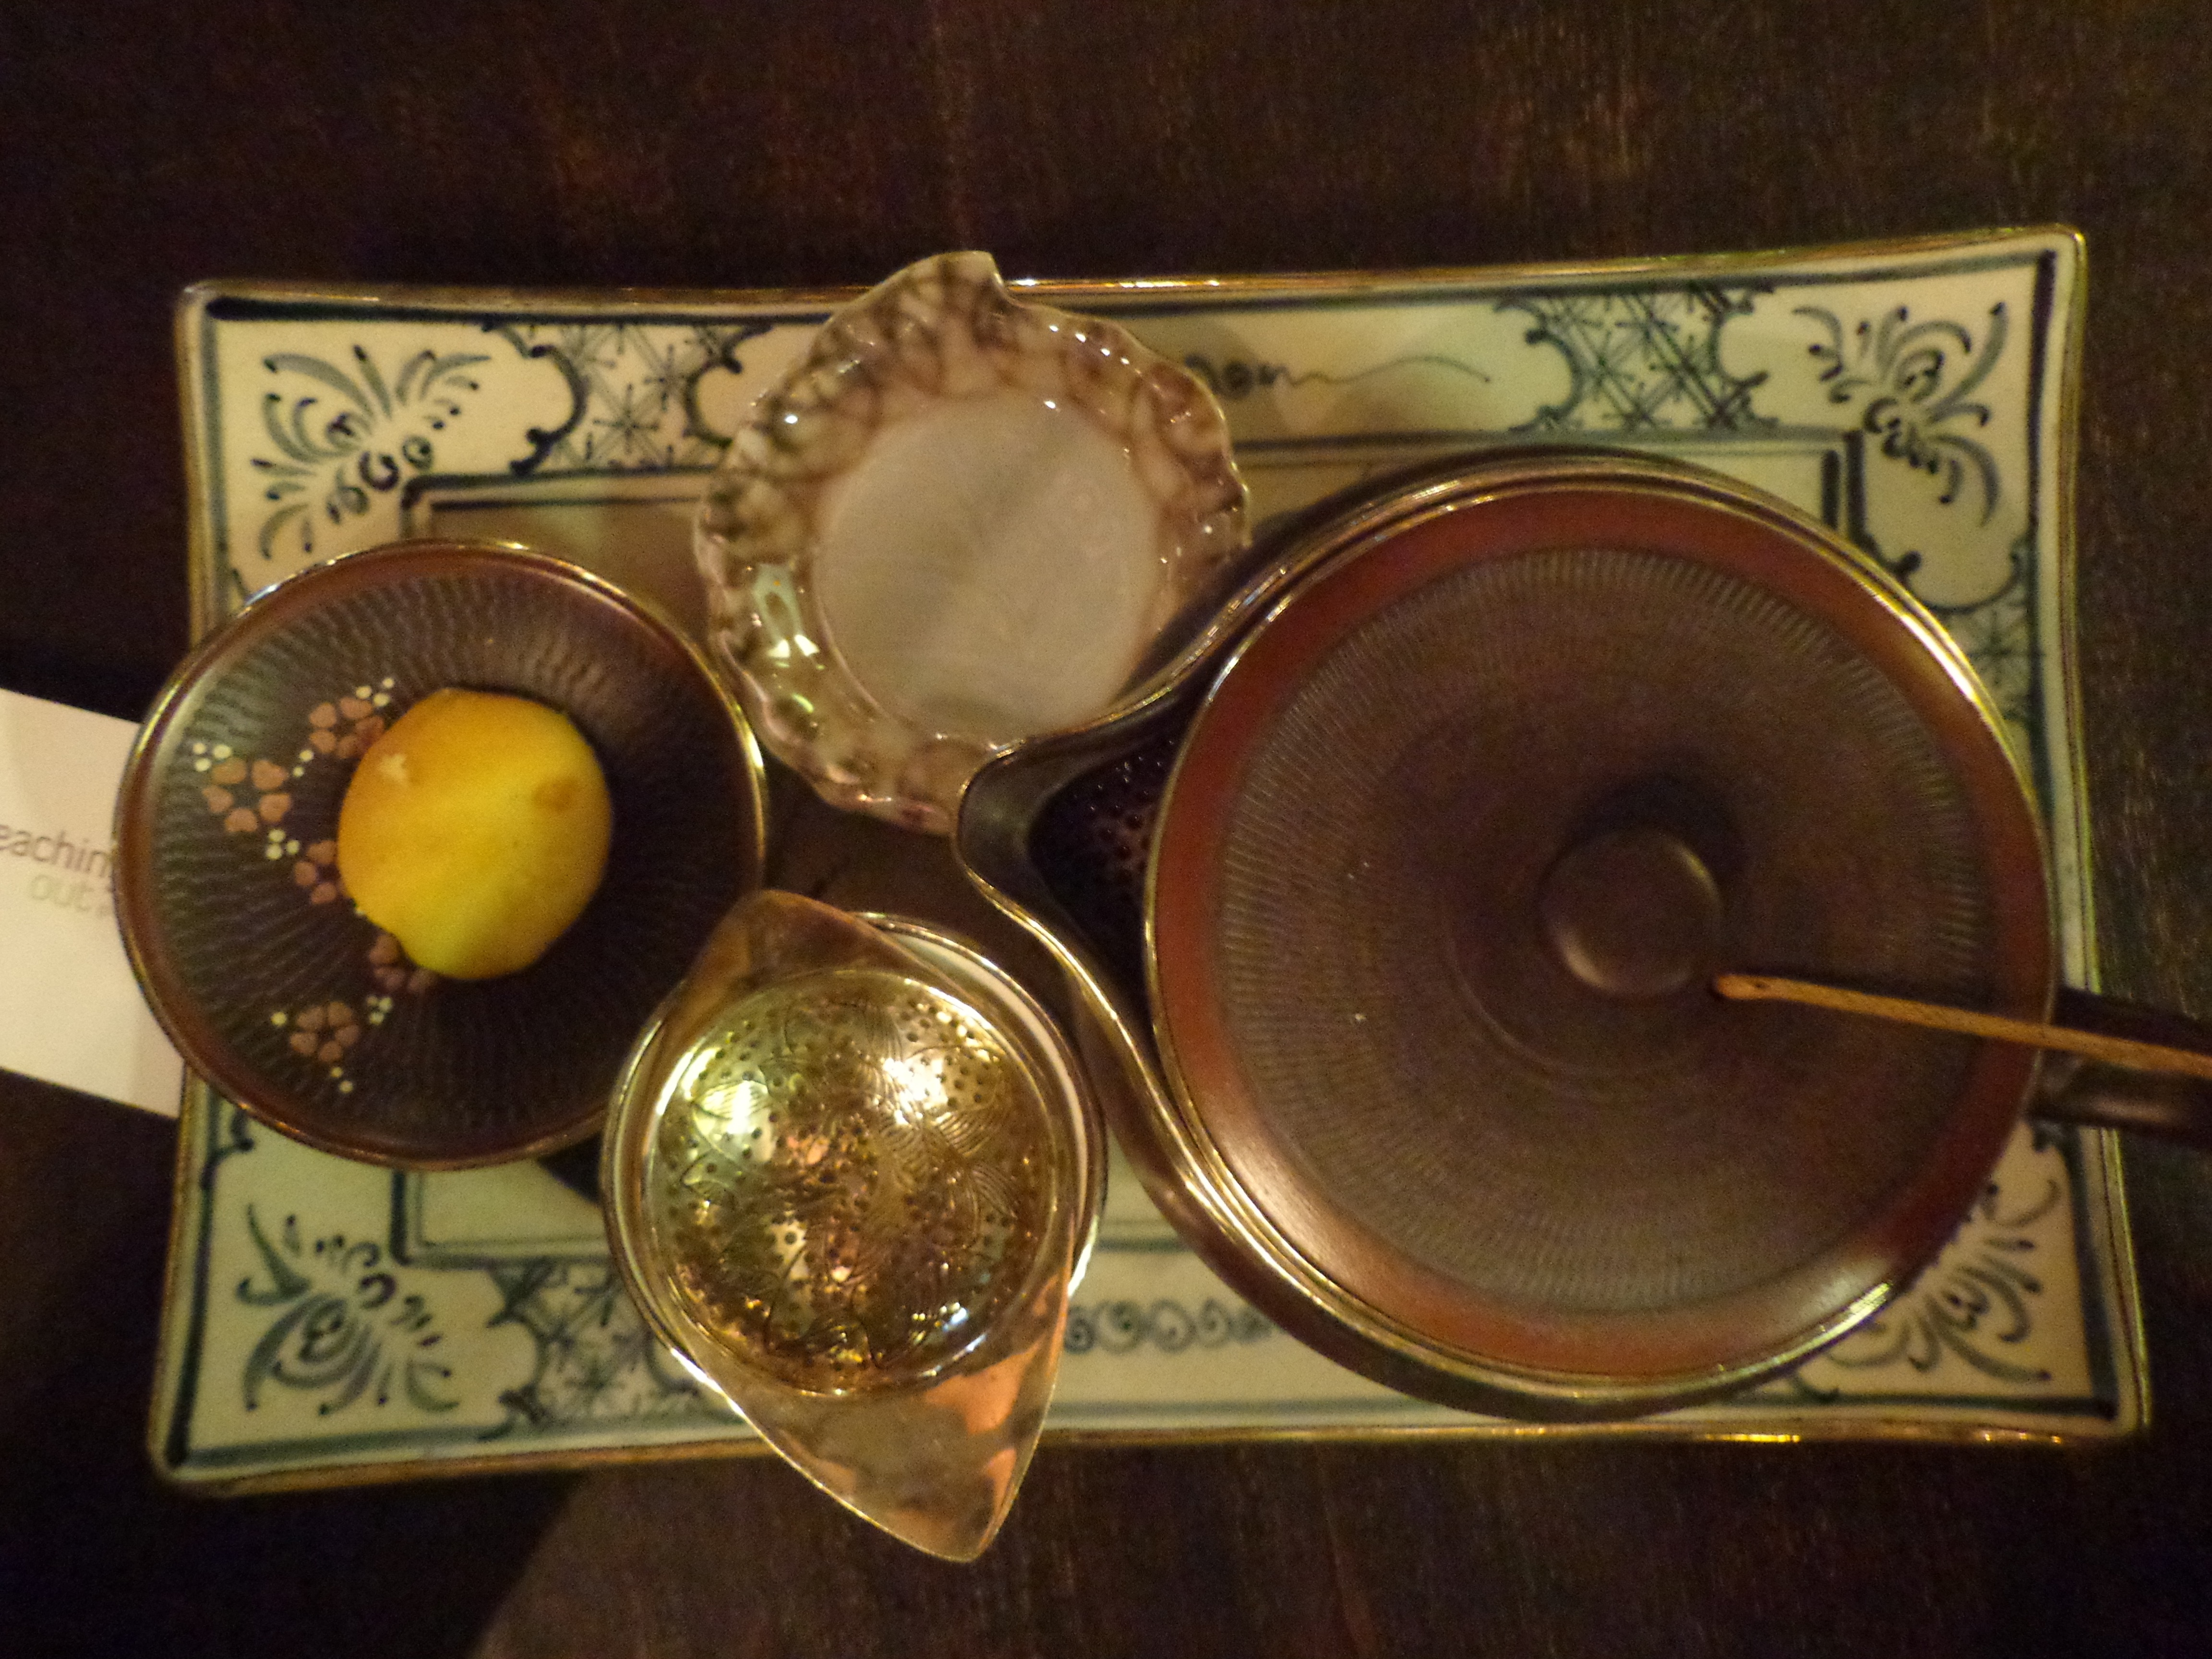 Jasmine tea served in a traditional tea set.